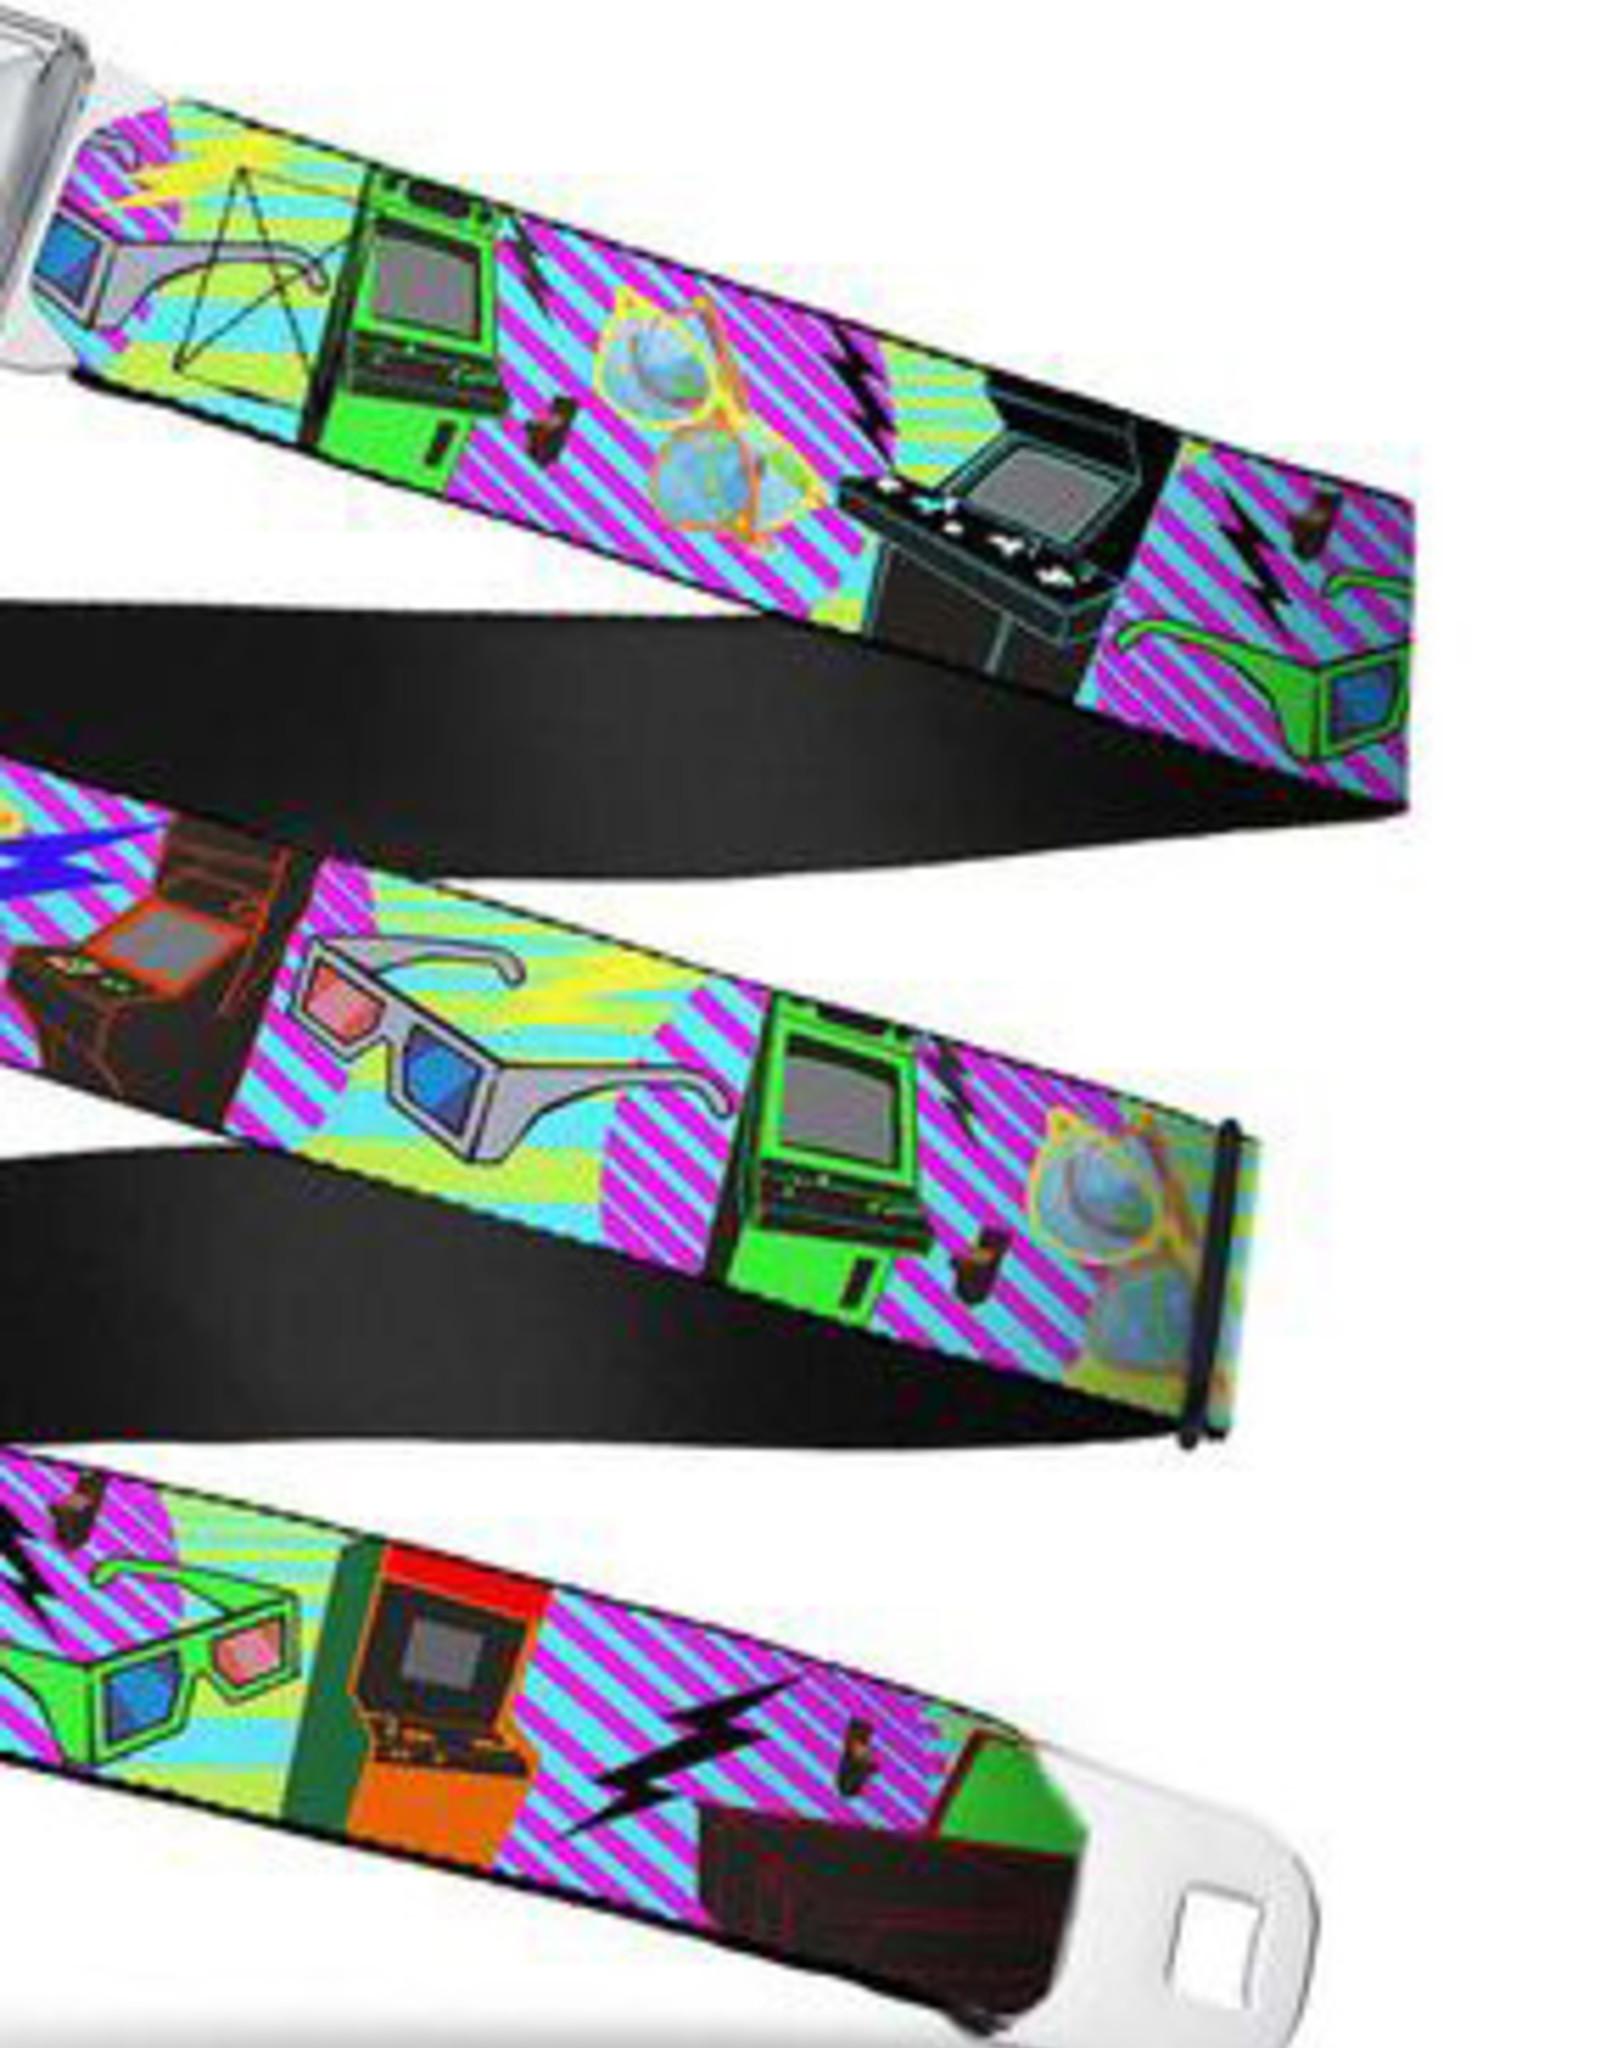 Buckle Down Belts Starburst Seatbelt Belt - Eighties Arcade Multi Neon Stripes Webbing